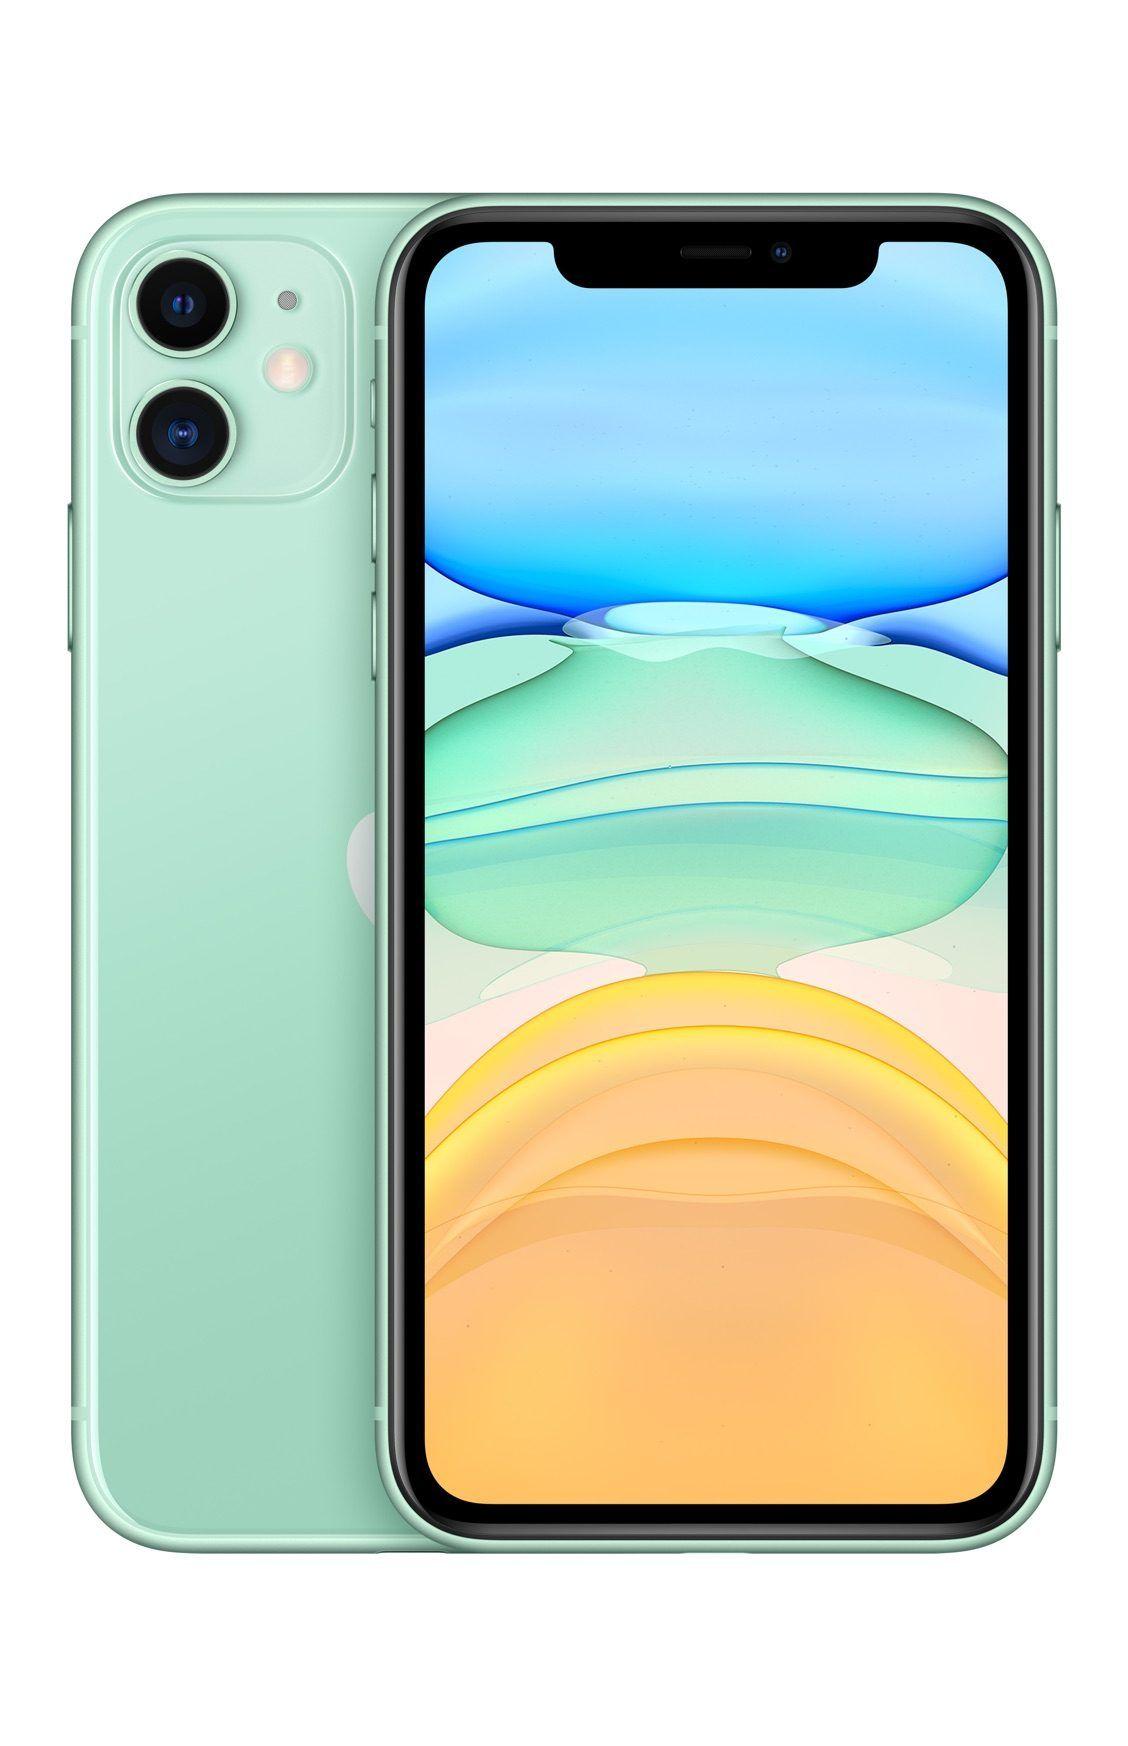 Apple iPhone 11, 128GB, Yellow, Boost Mobile in 2020